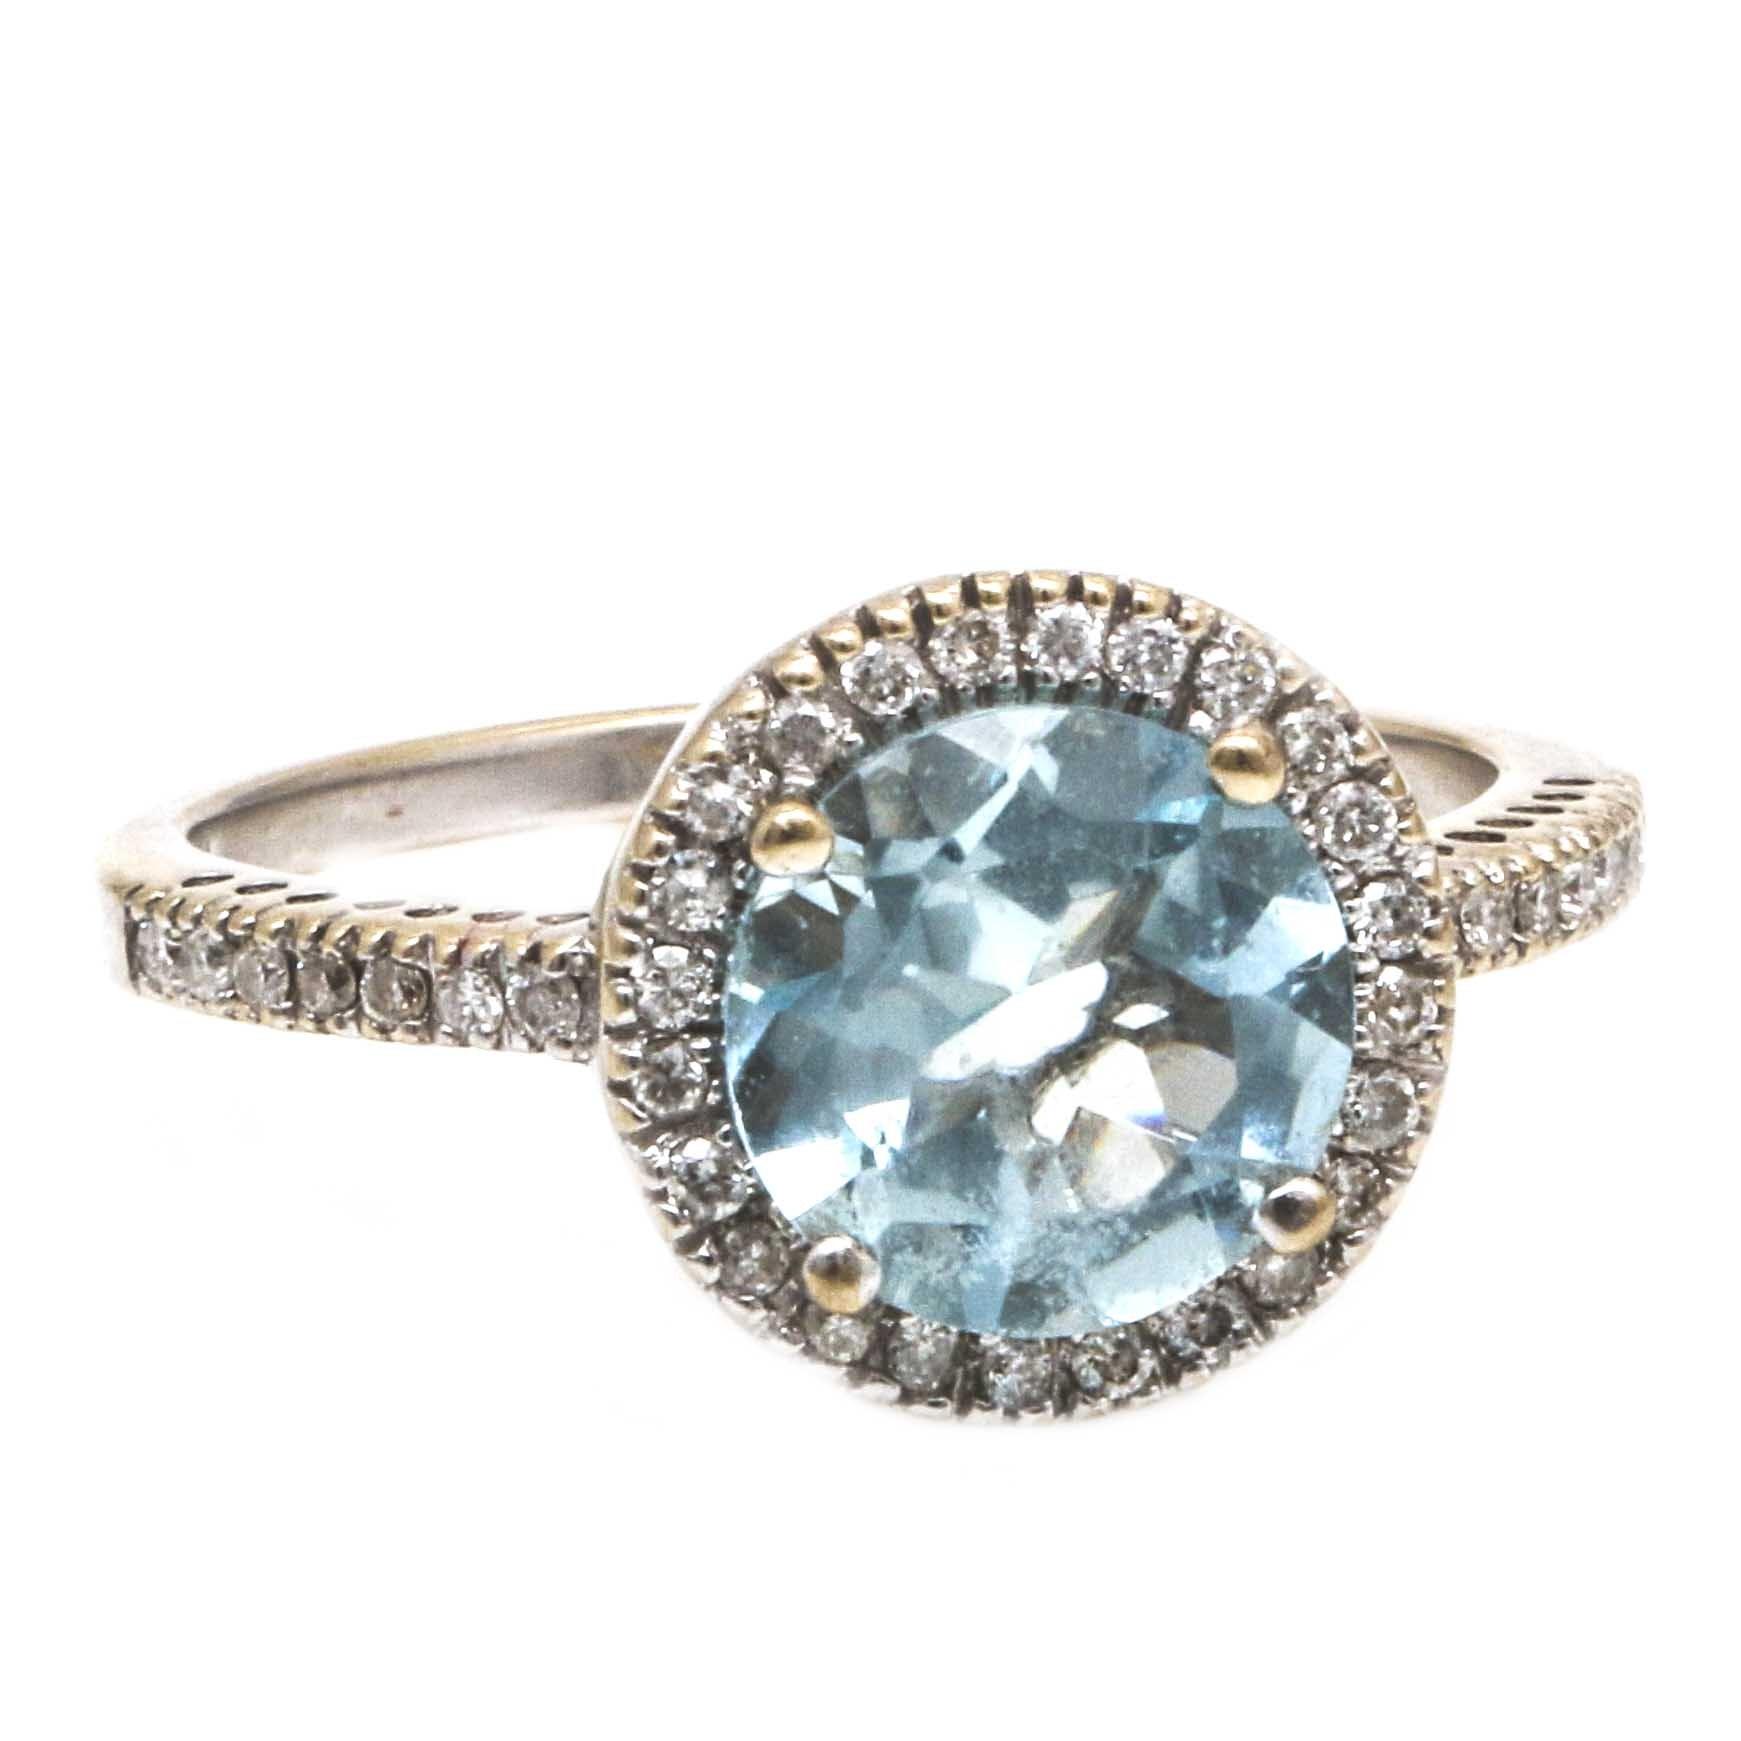 14K White Gold 1.43 CTS Aquamarine and Diamond Ring